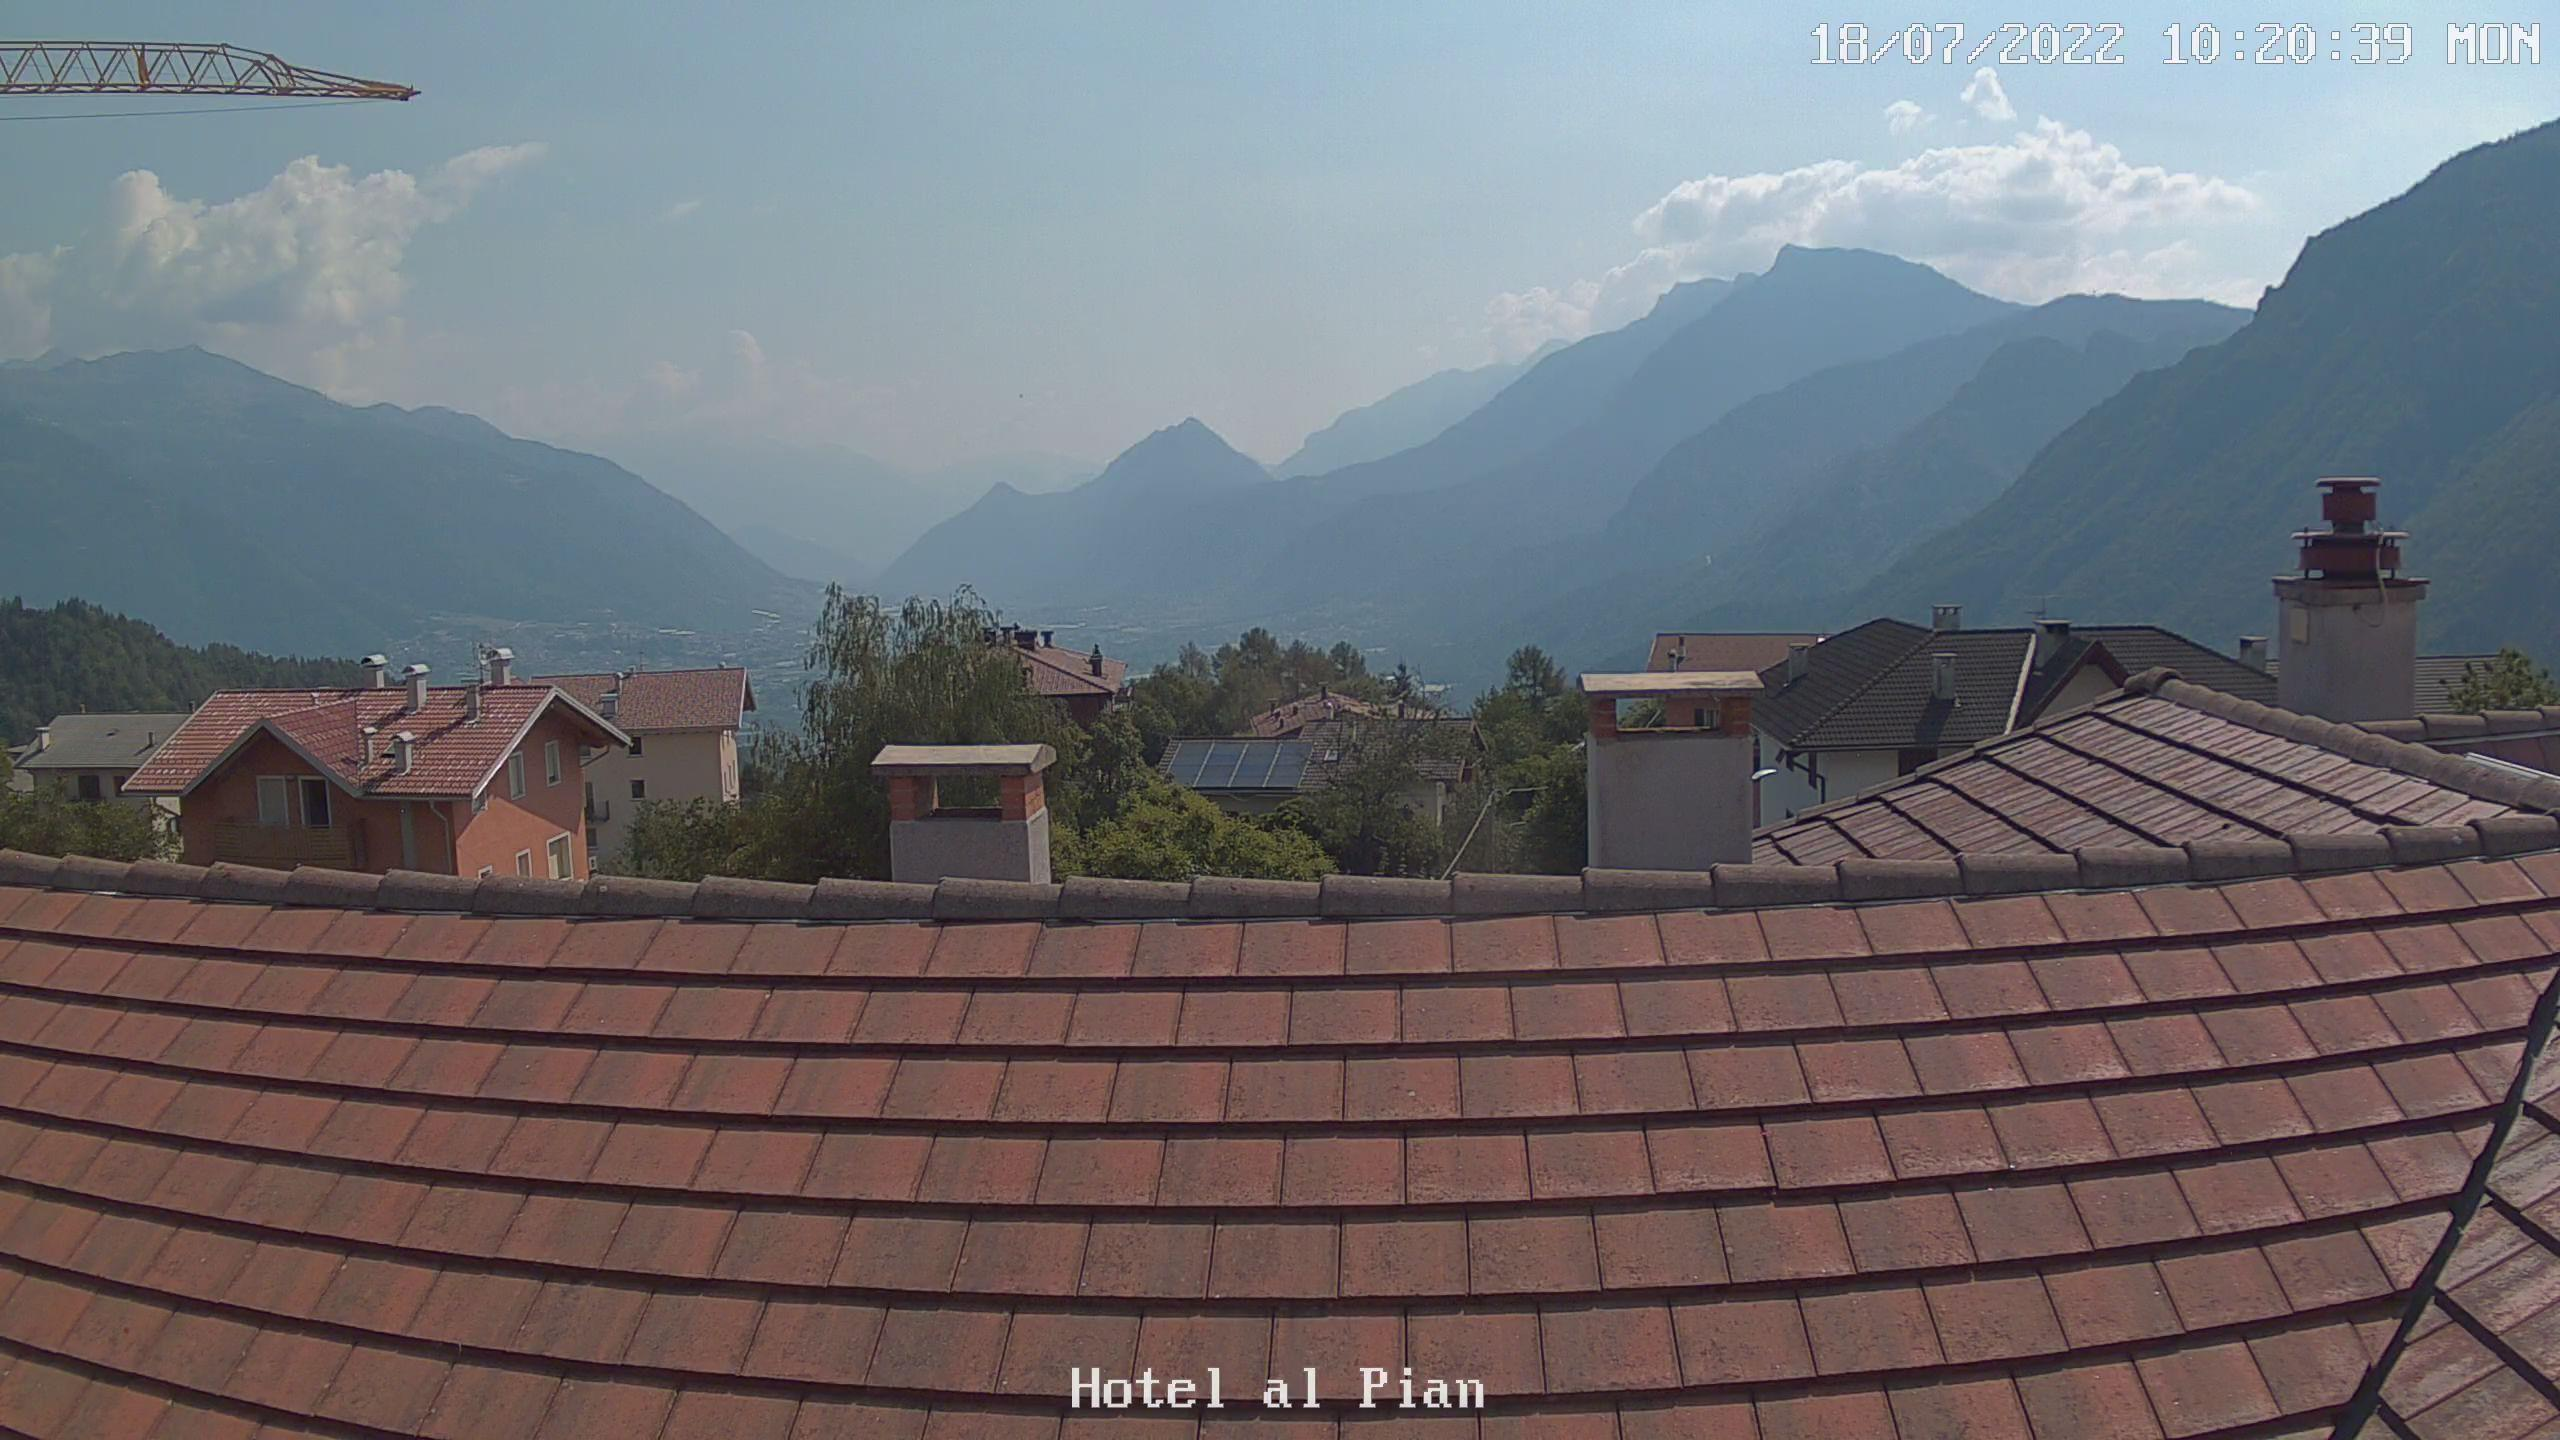 Webcam a cura di Meteo Al Pian. Puntamento verso la Valsugana